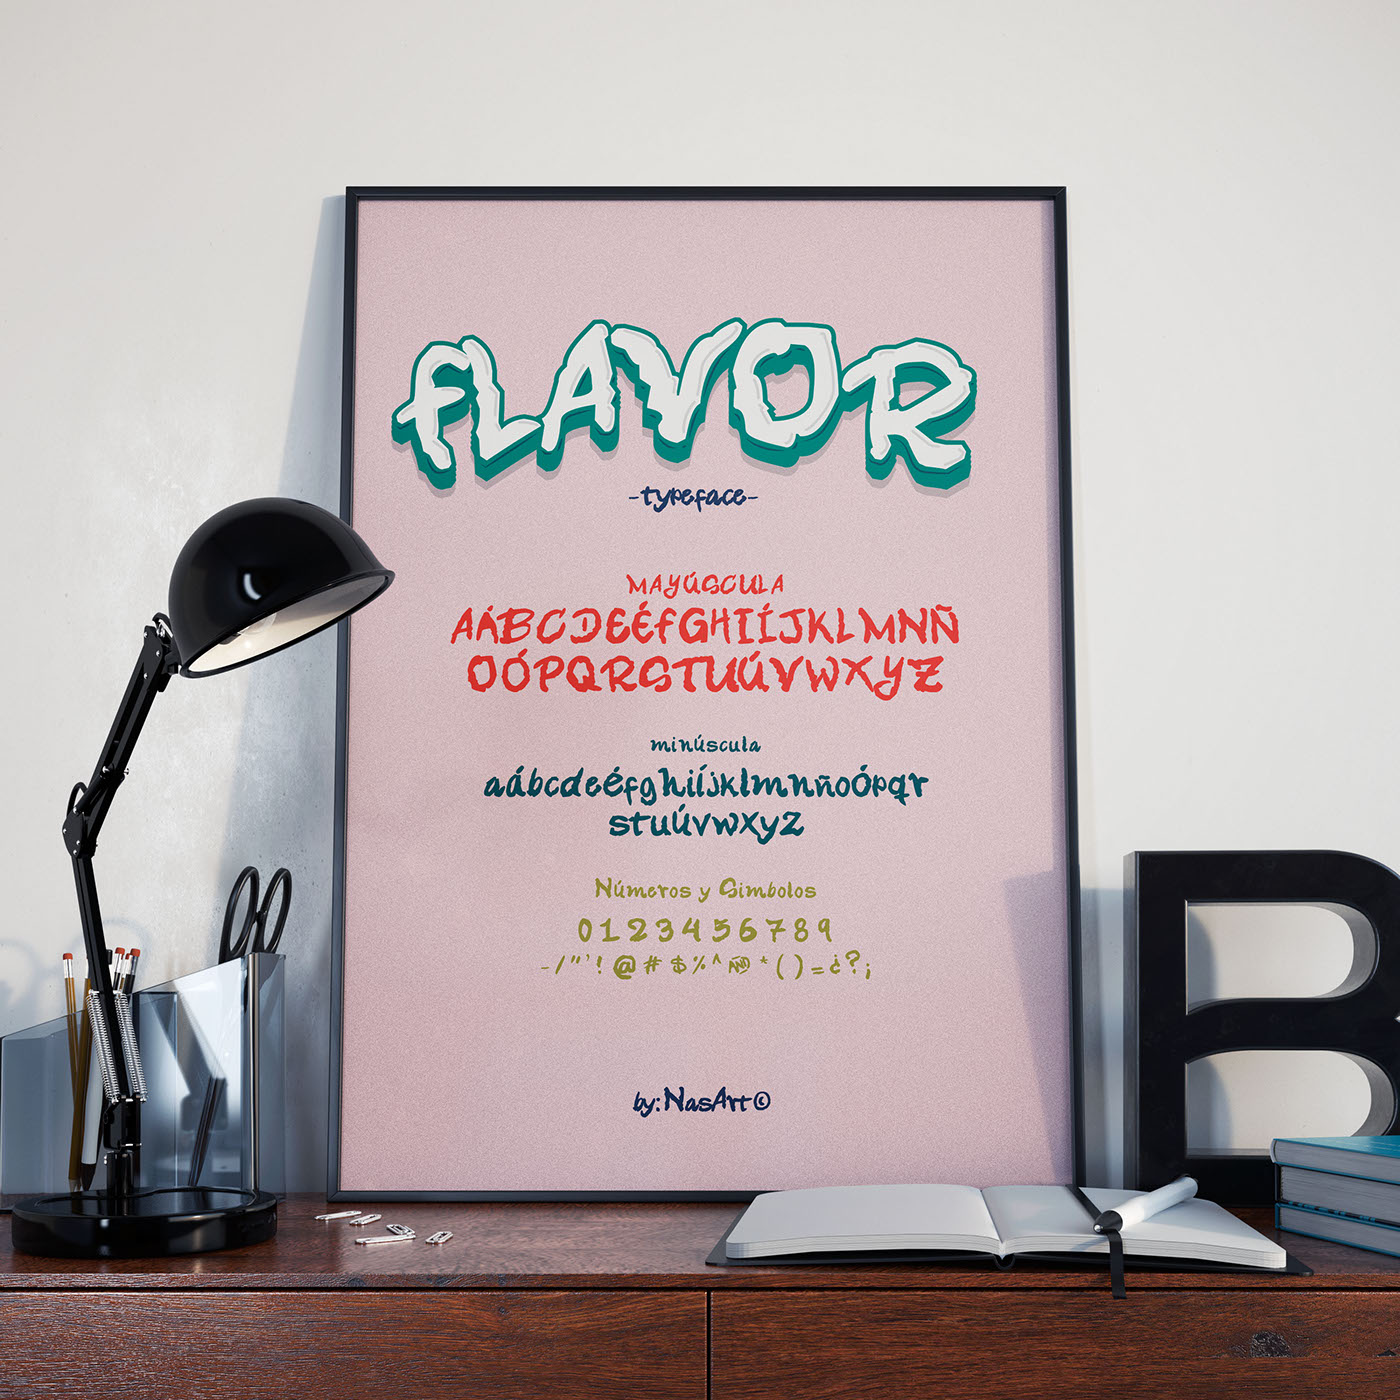 Nasser-Araujo_Flavor-handmade-type_260617_prev03